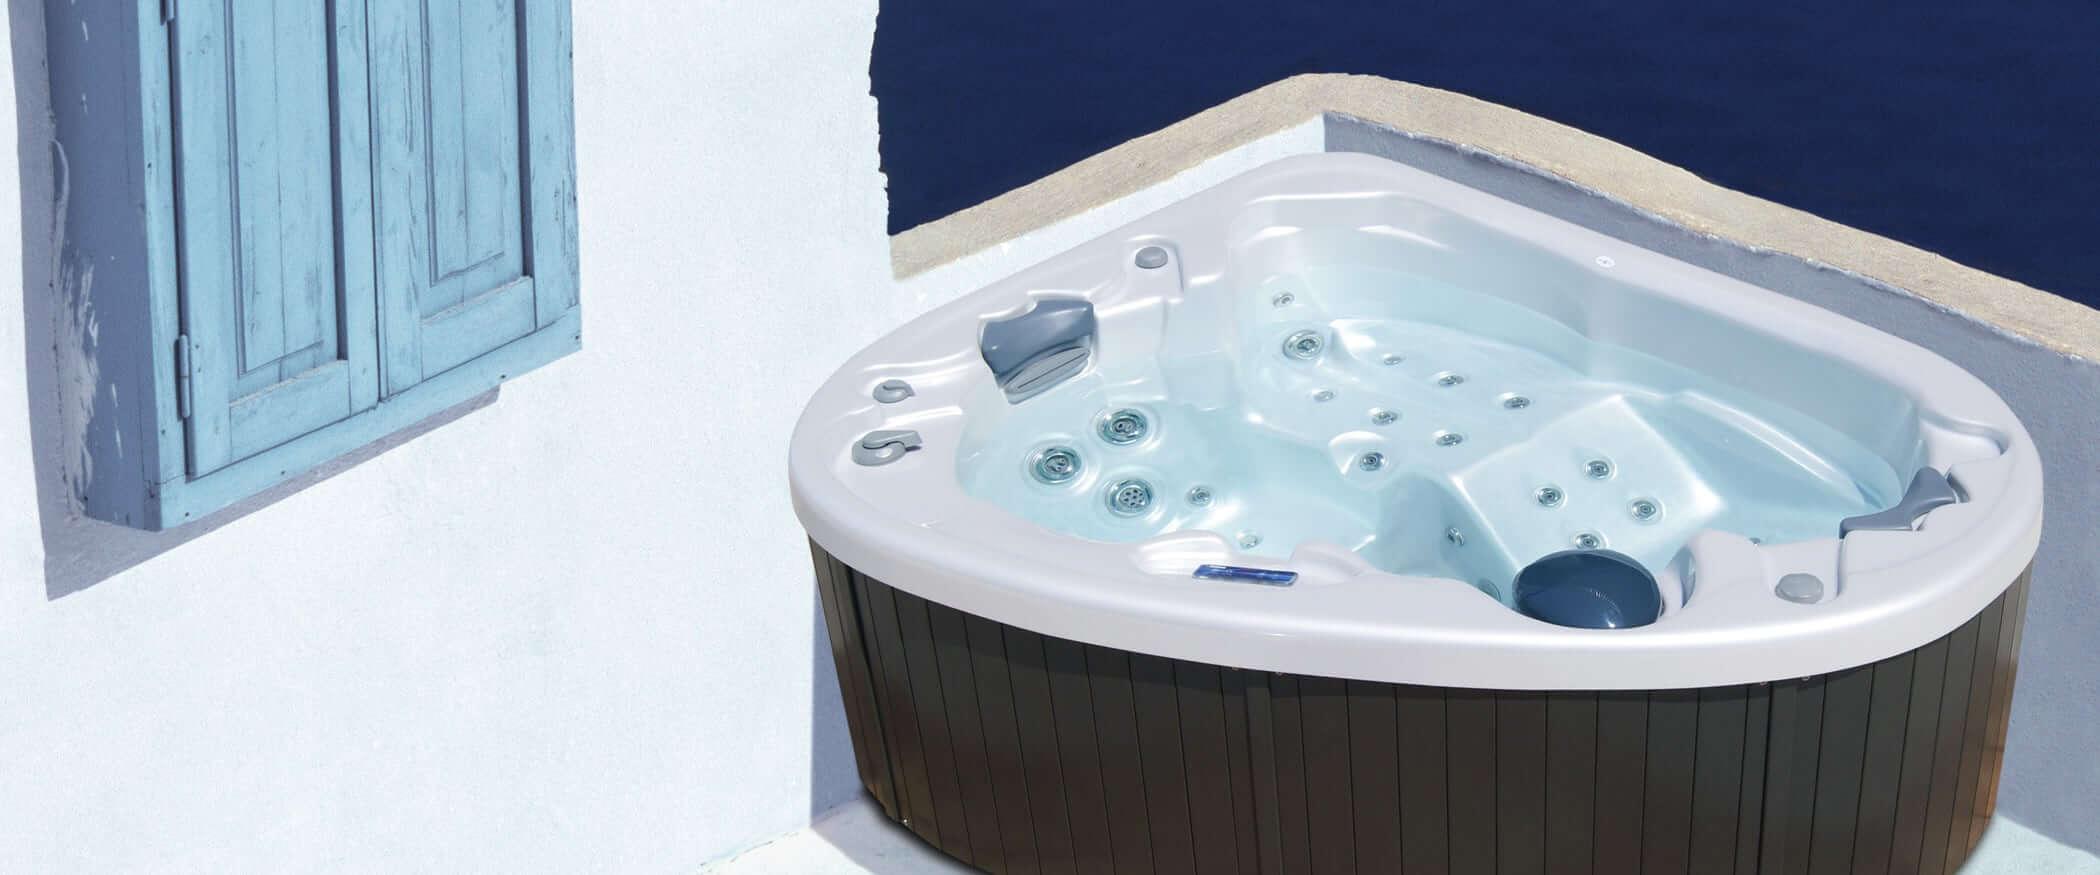 Jacuzzi Balboa 2 Places.Buy The Corner Hot Tub Aqualife Calypso Aquavia Spa